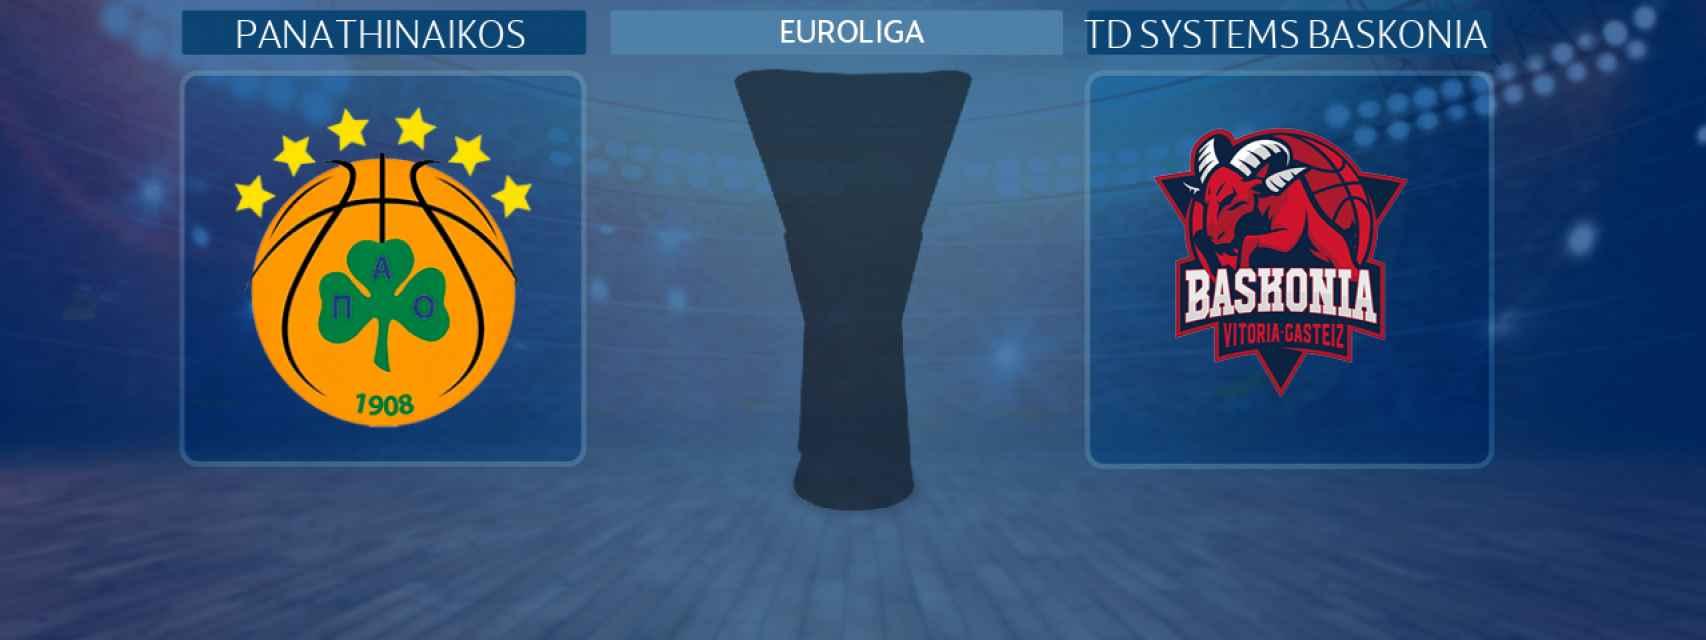 Panathinaikos - TD Systems Baskonia, partido de la Euroliga